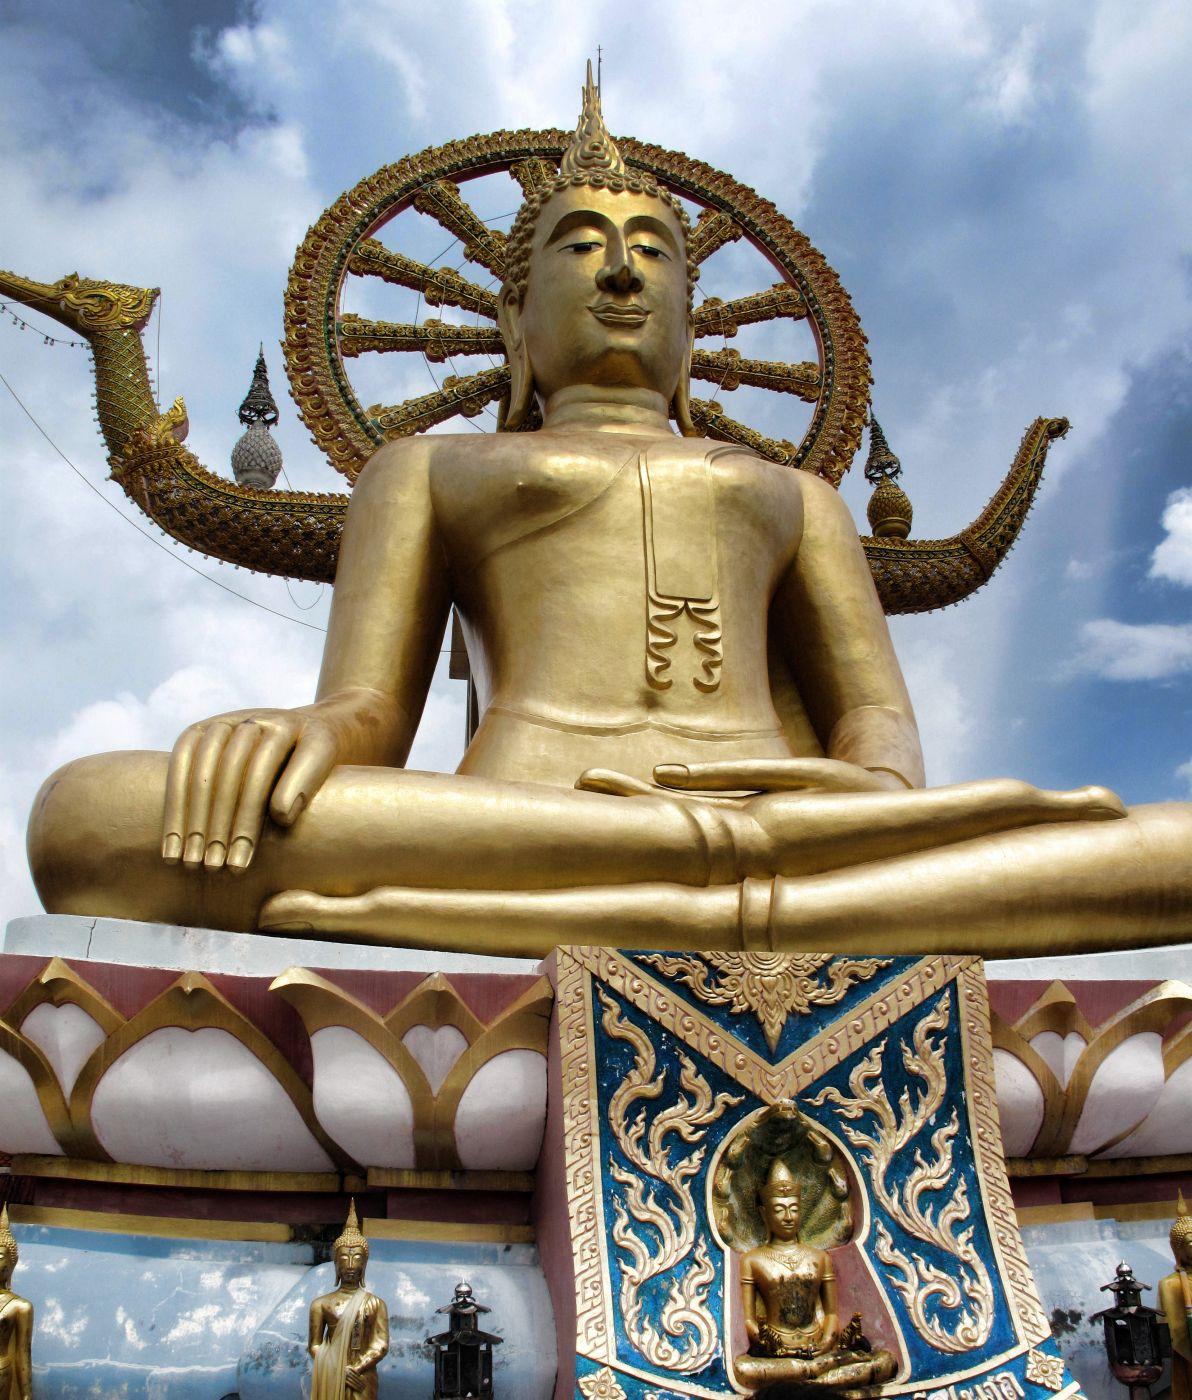 Big Buddha Temple (Wat Phra Yai), Thailand